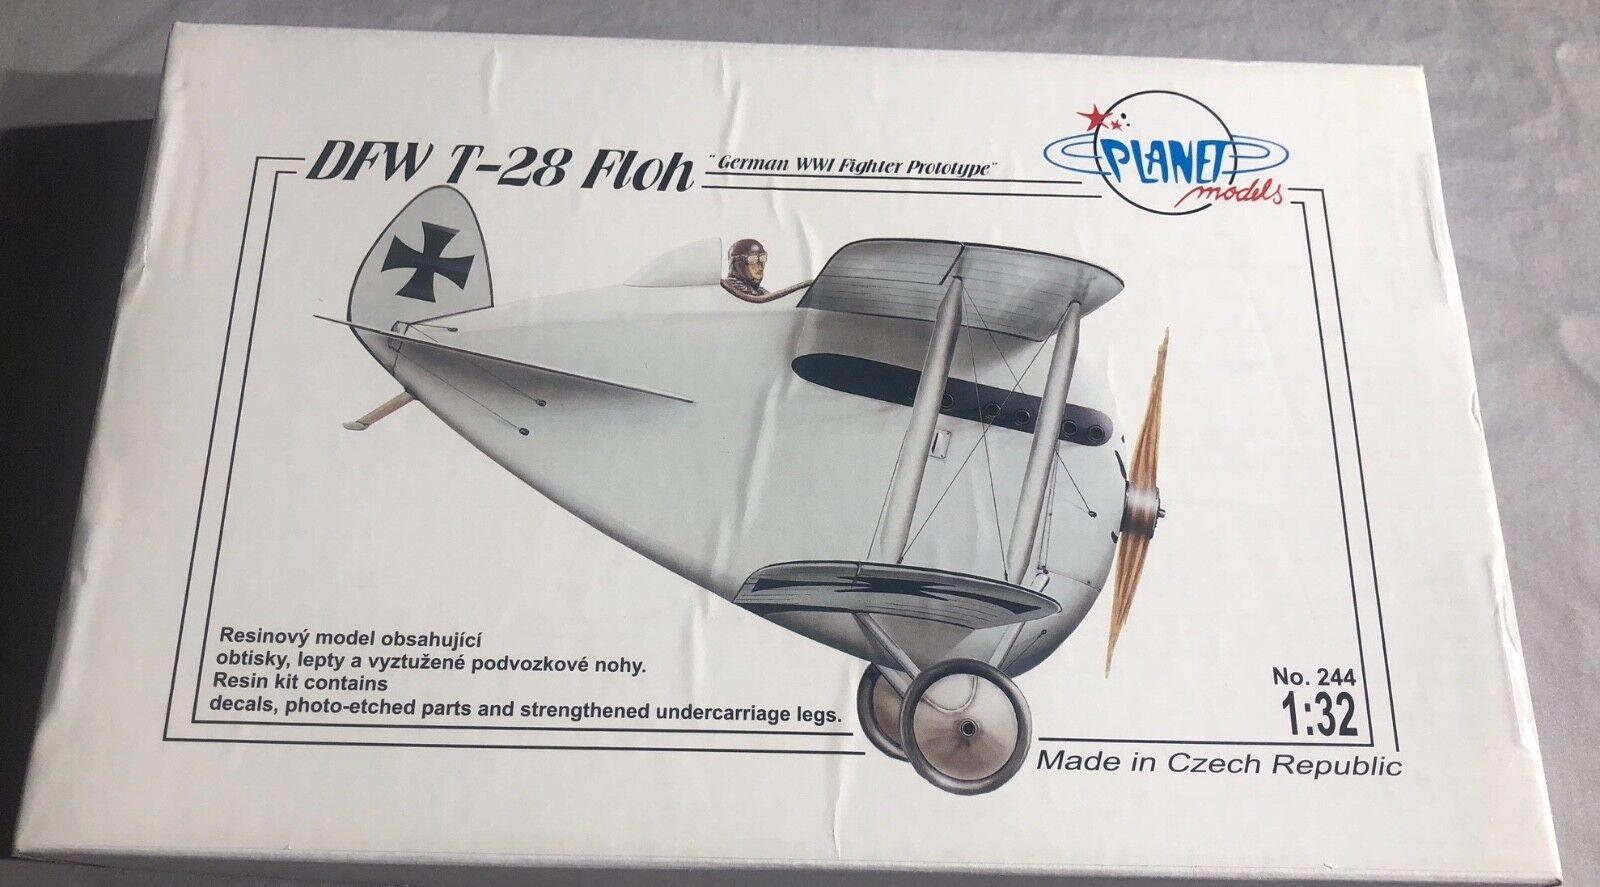 Planet Models DFW T-28 Floh 1 32 Resin 'Sullys Hobbies'